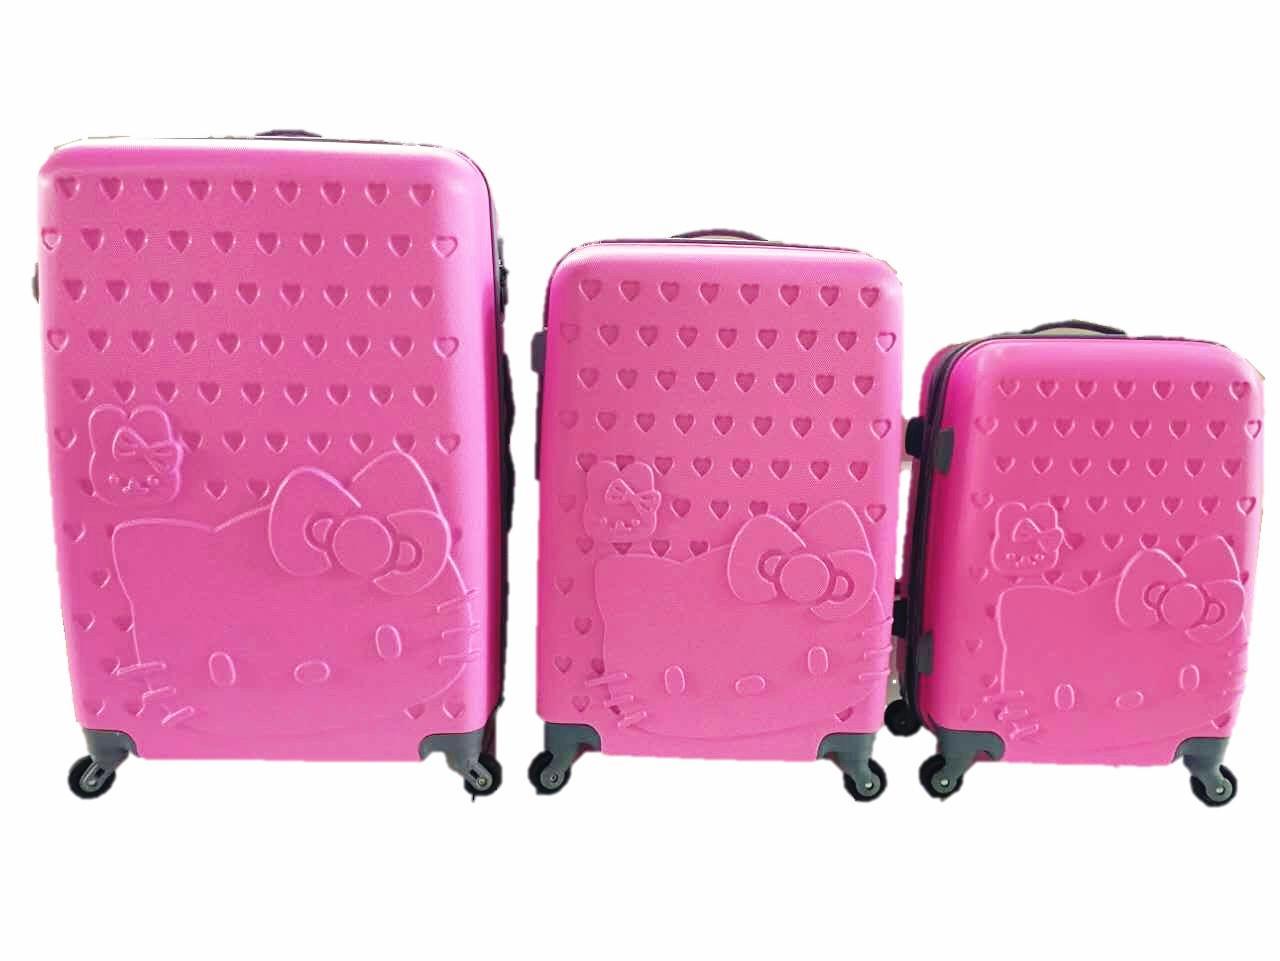 f663aa680b Hello Cute Kitty ABS Hard Case Lugga (end 5 10 2019 4 07 PM)